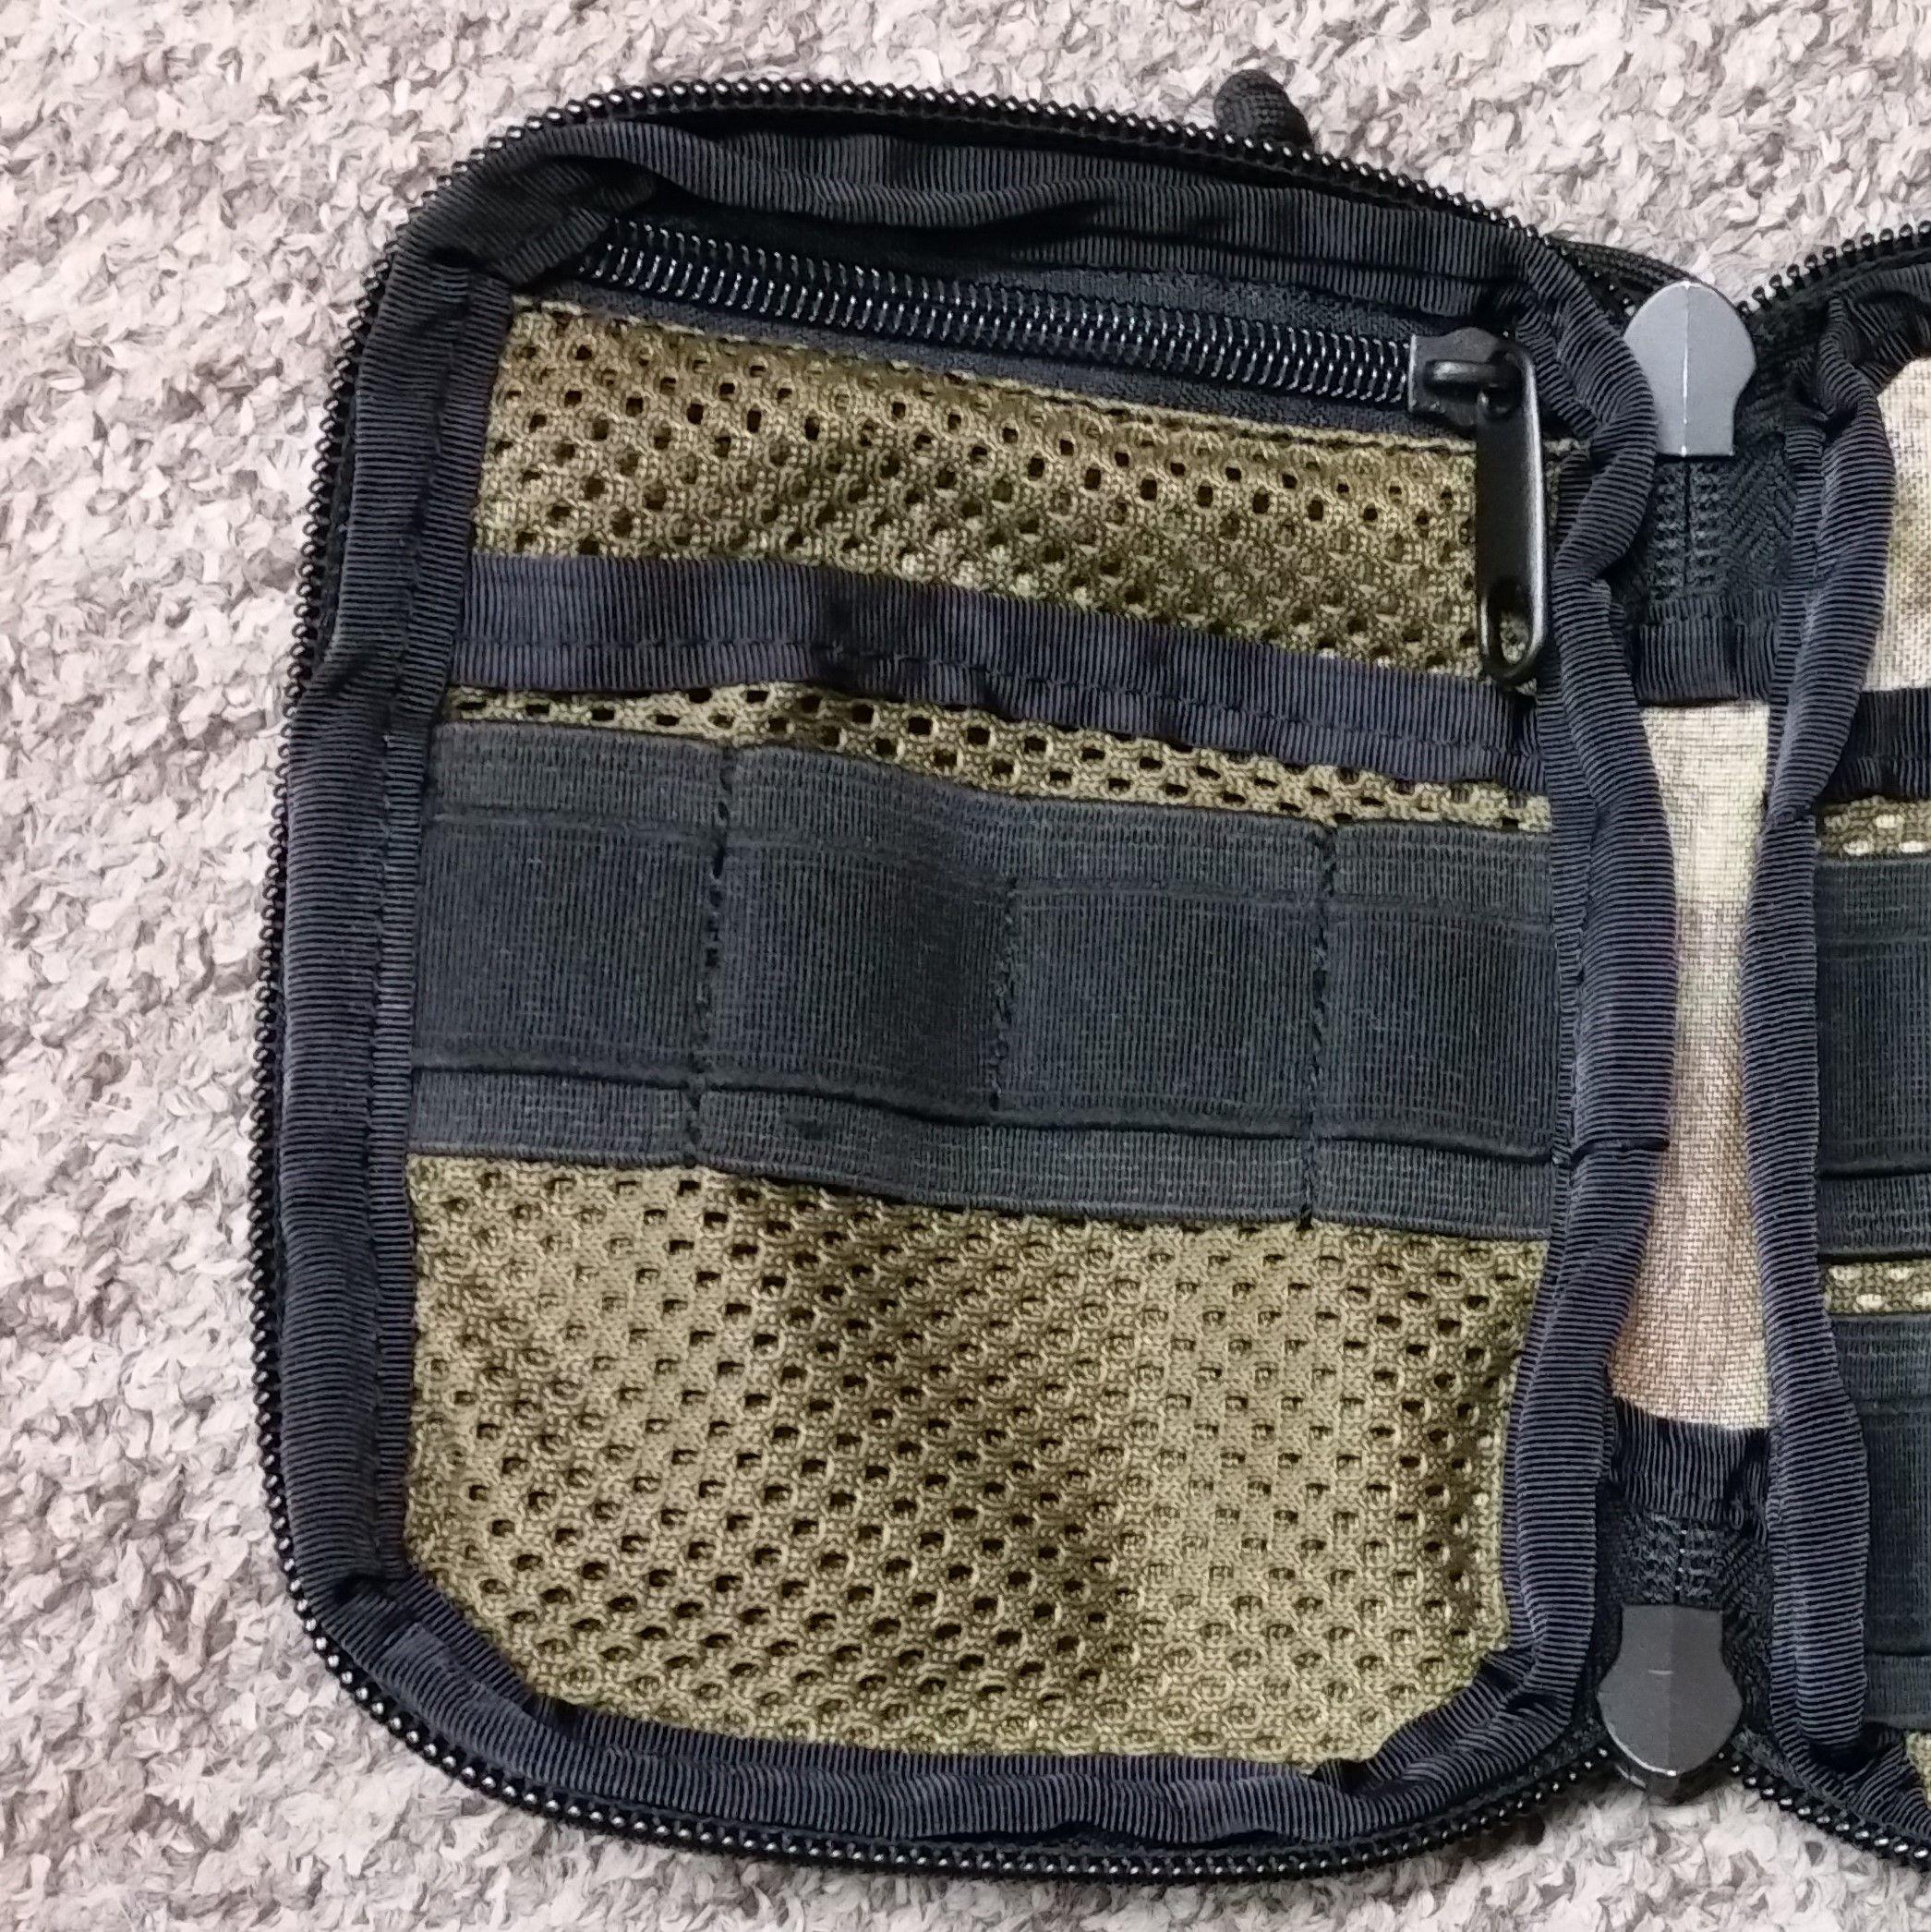 Pocket with zipper closure instead of flat, mesh pocket +9pln